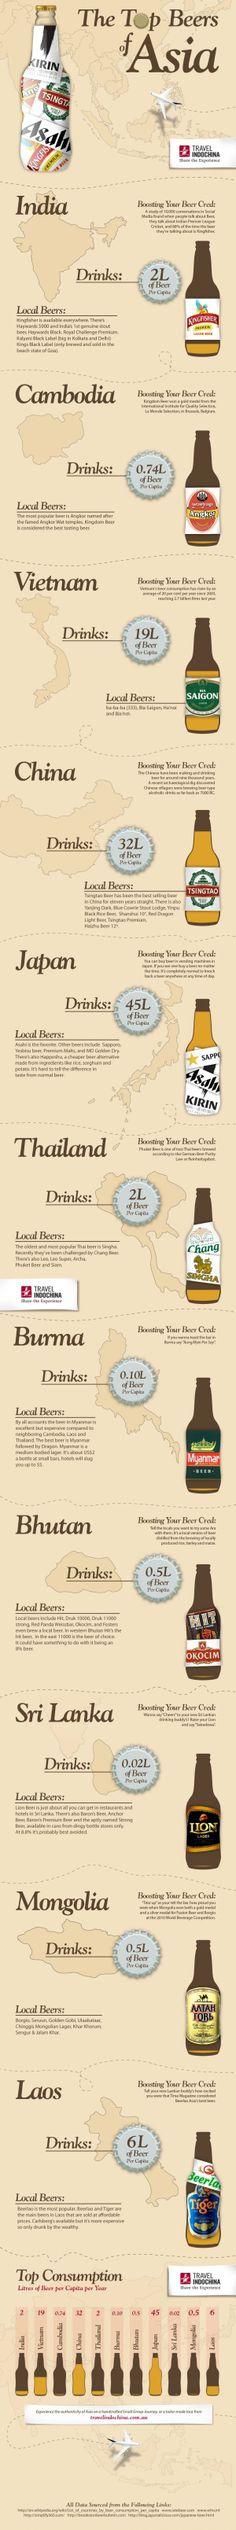 Top Beers of Asia